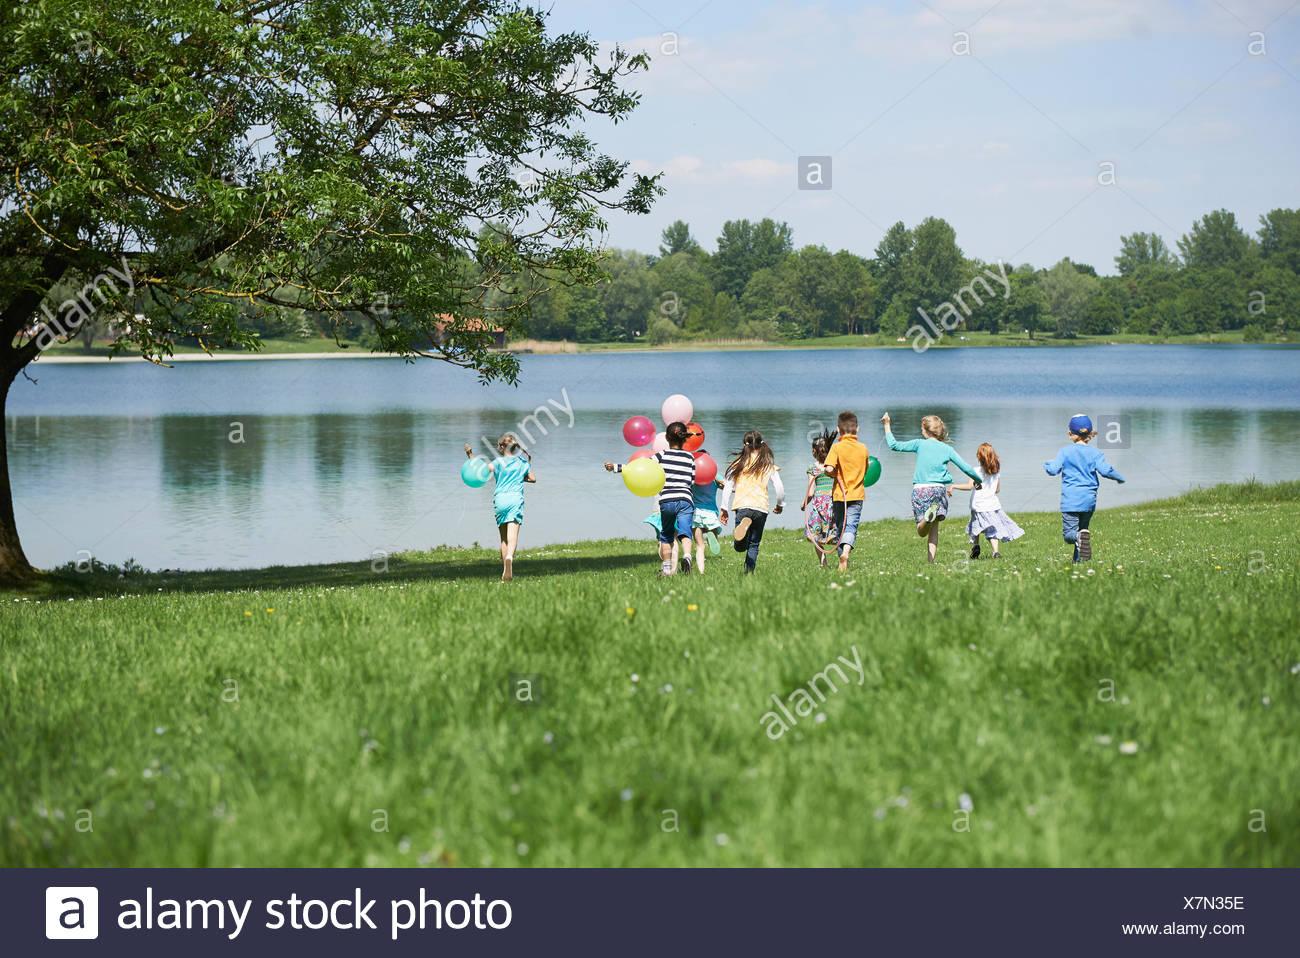 Rear view of children running in park with balloons, Lake Karlsfeld, Munich, Bavaria, Germany - Stock Image